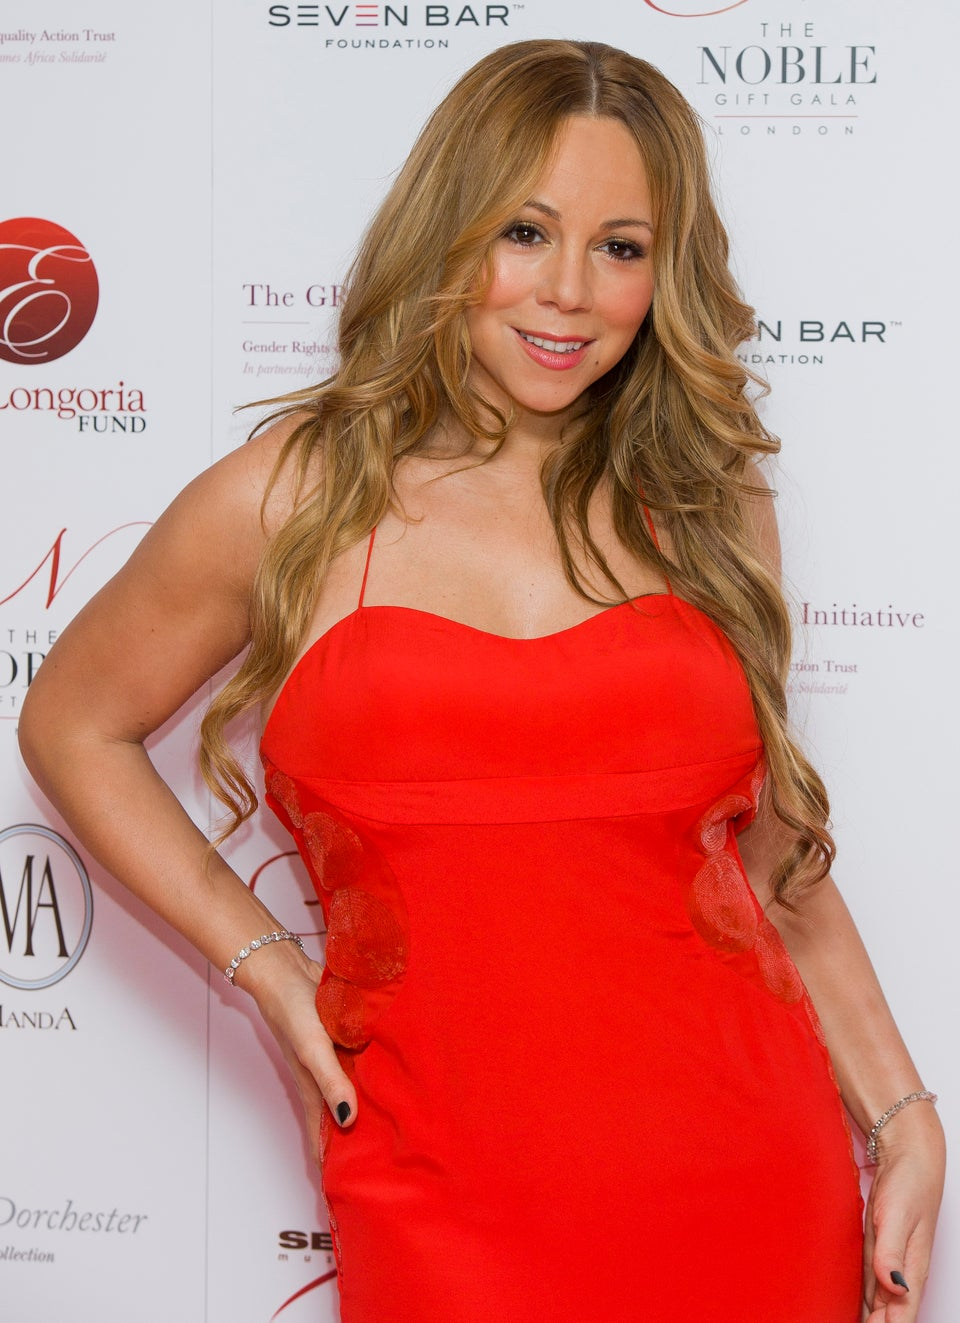 Mariah Carey, Maya Angelou, Stevie Wonder Among BET Honorees